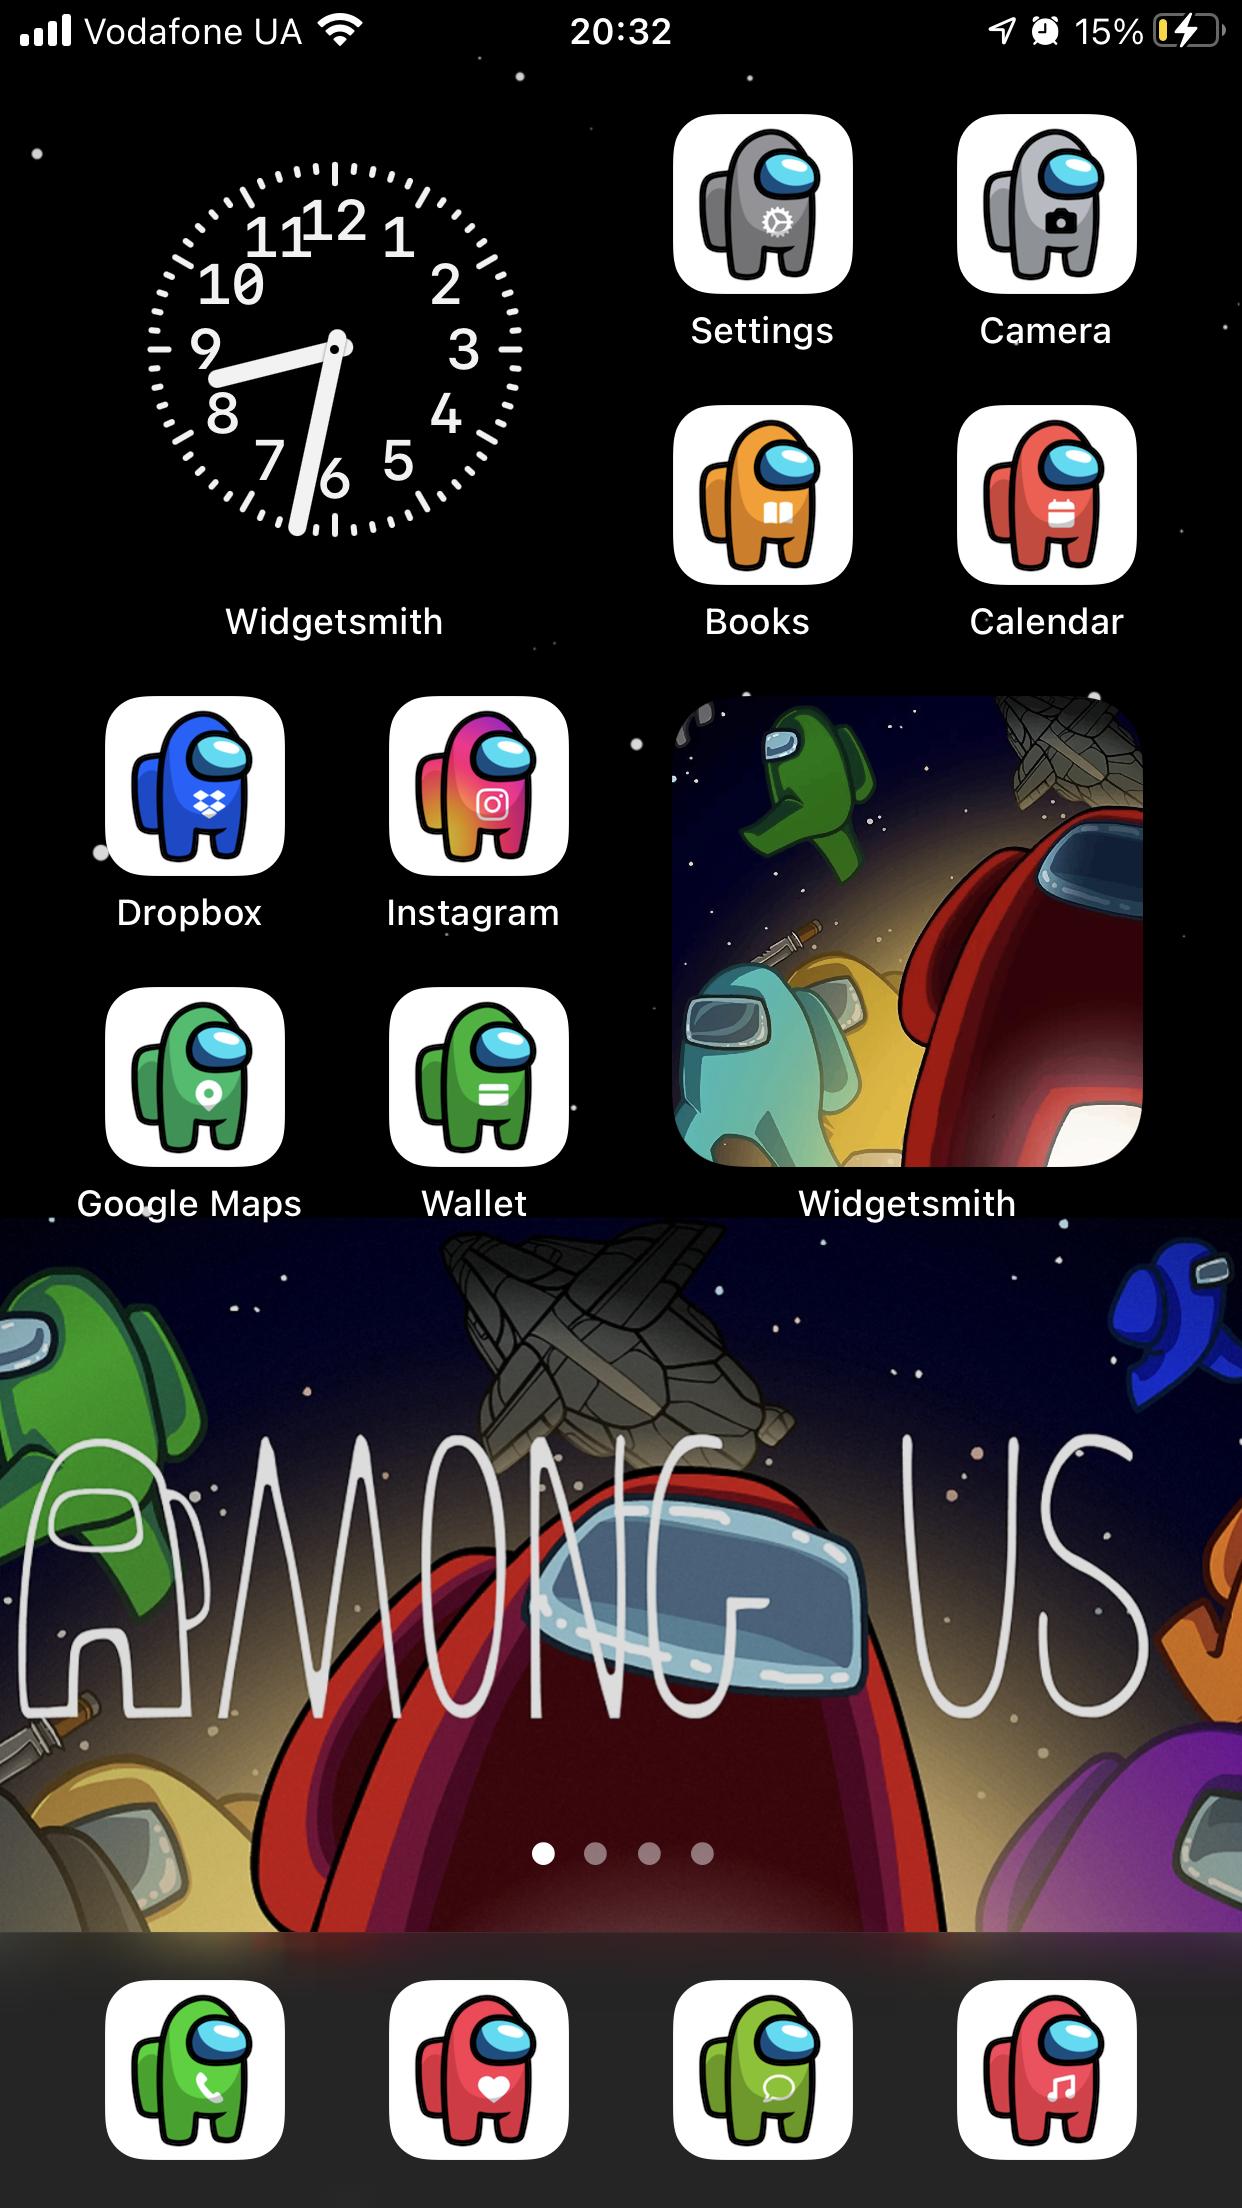 Among Us Ios 14 App Icons Ios14 Among Us Aesthetic Home Screen Among Us Iphone Ios14 Theme App Icon Iphone Wallpaper App Game Wallpaper Iphone